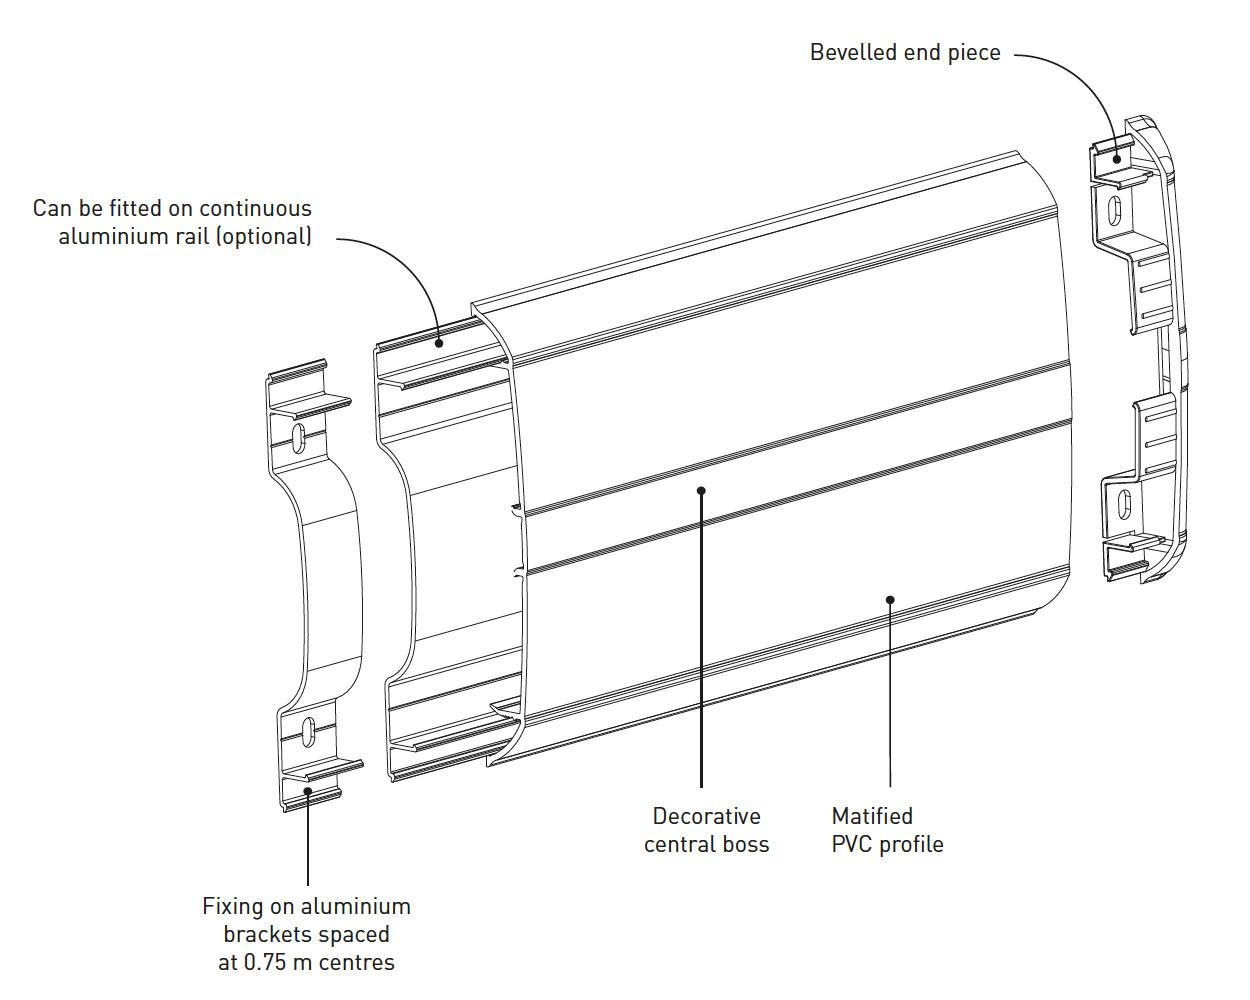 Muurstootlijst SPM Linea Punch Neo tekening systeem